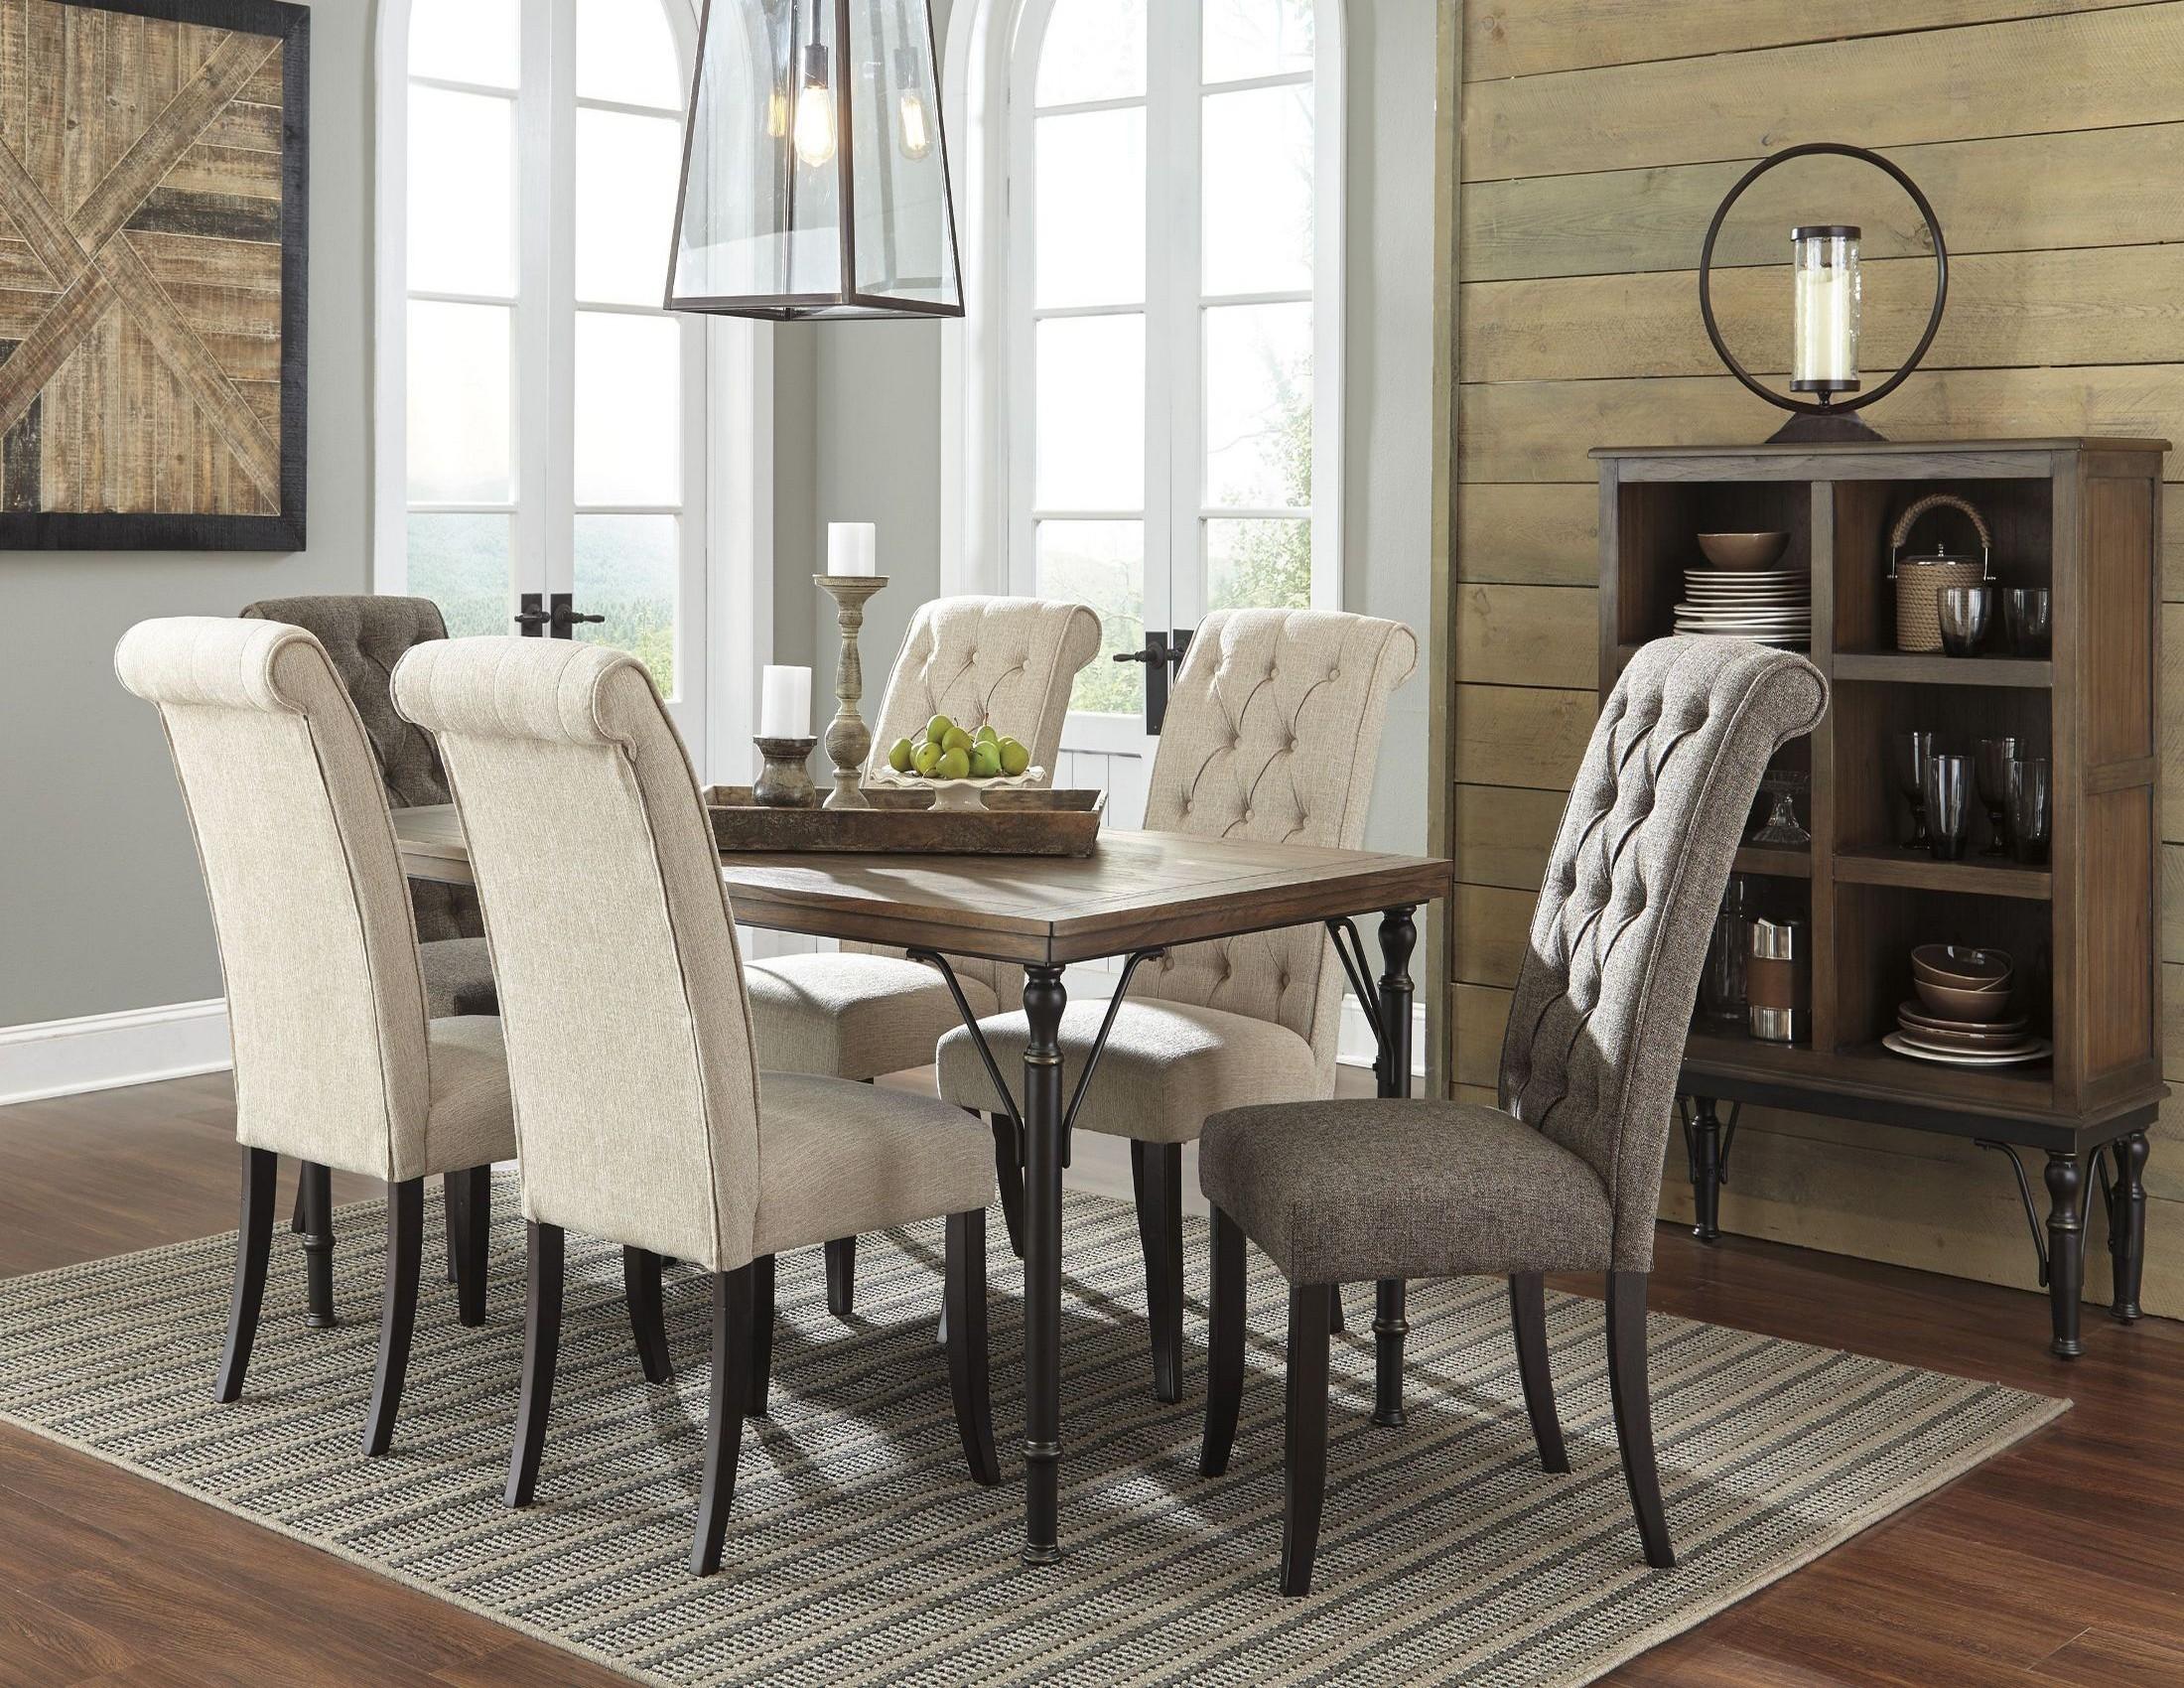 tripton rectangular dining room set from ashley